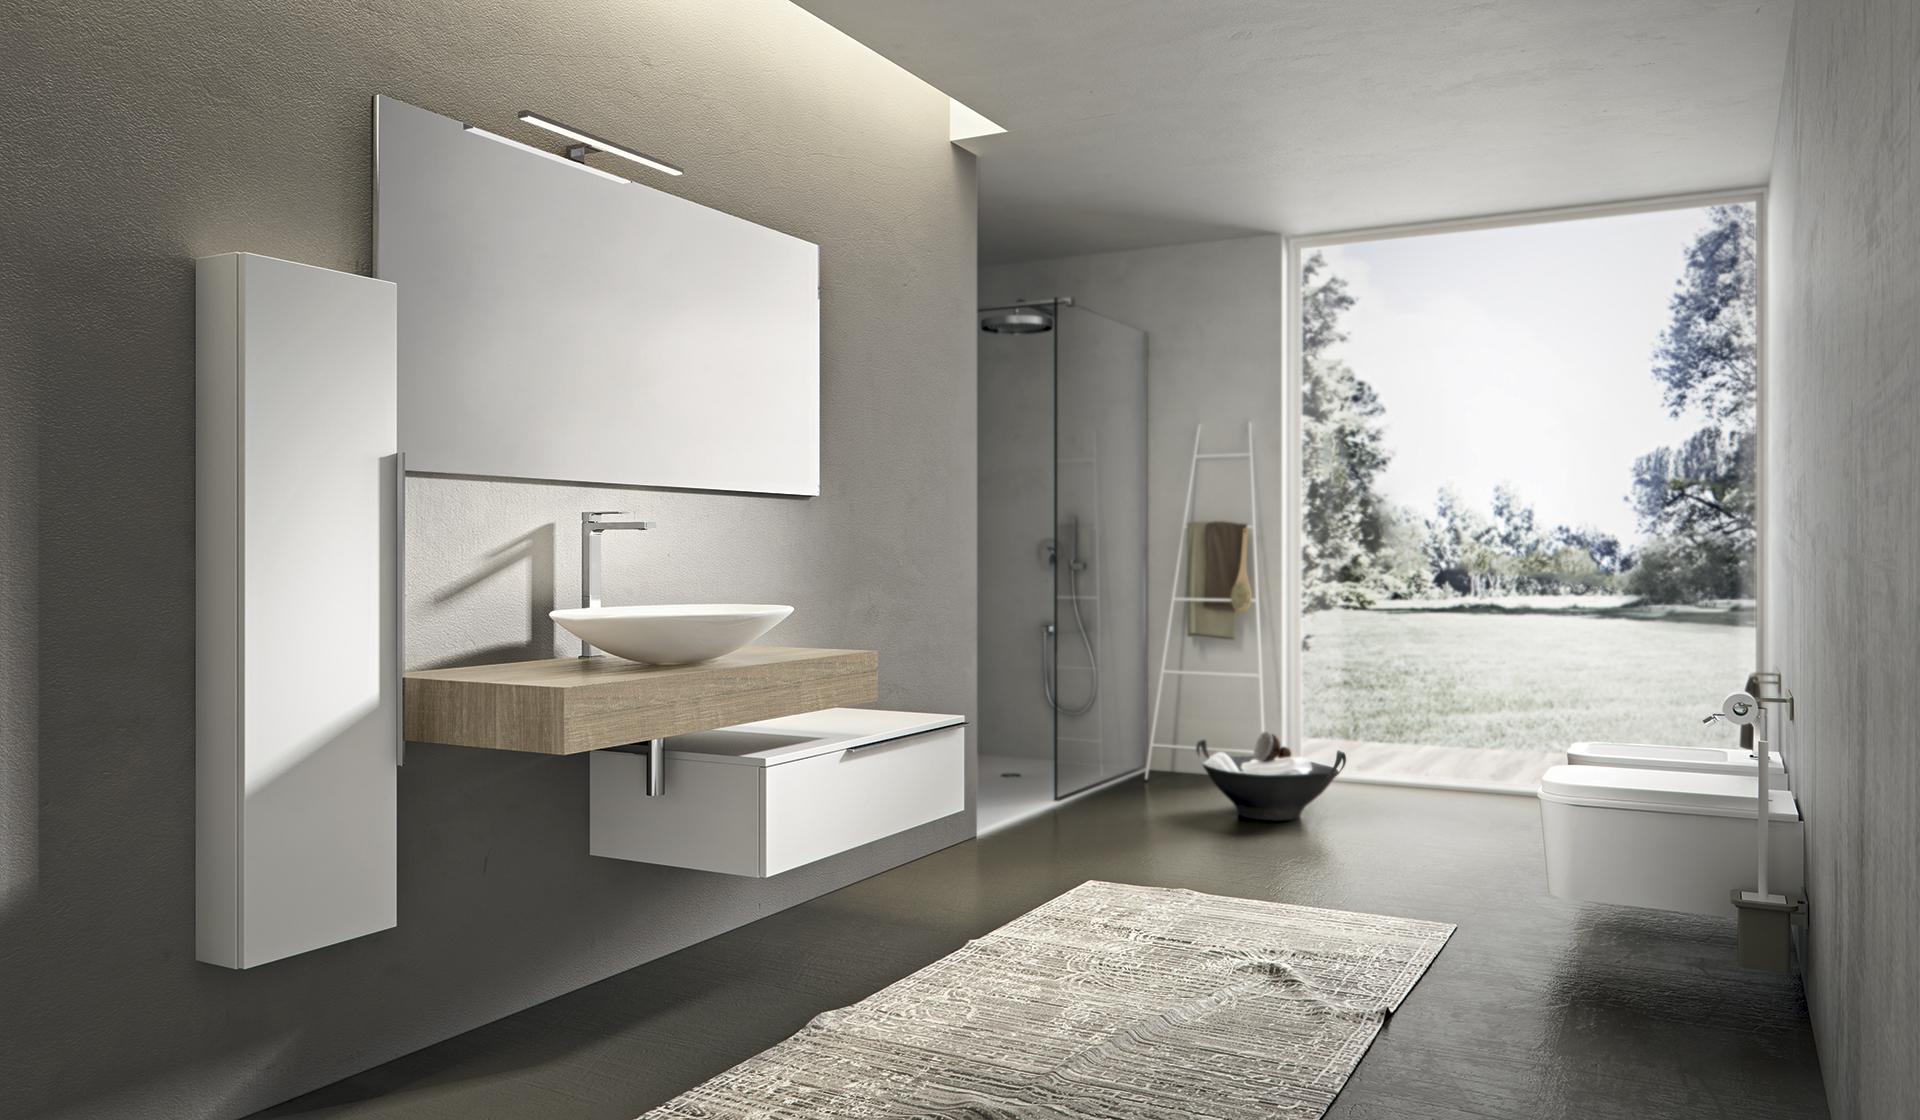 Mobili bagno ab mobili - Piastrelle per bagni moderni ...